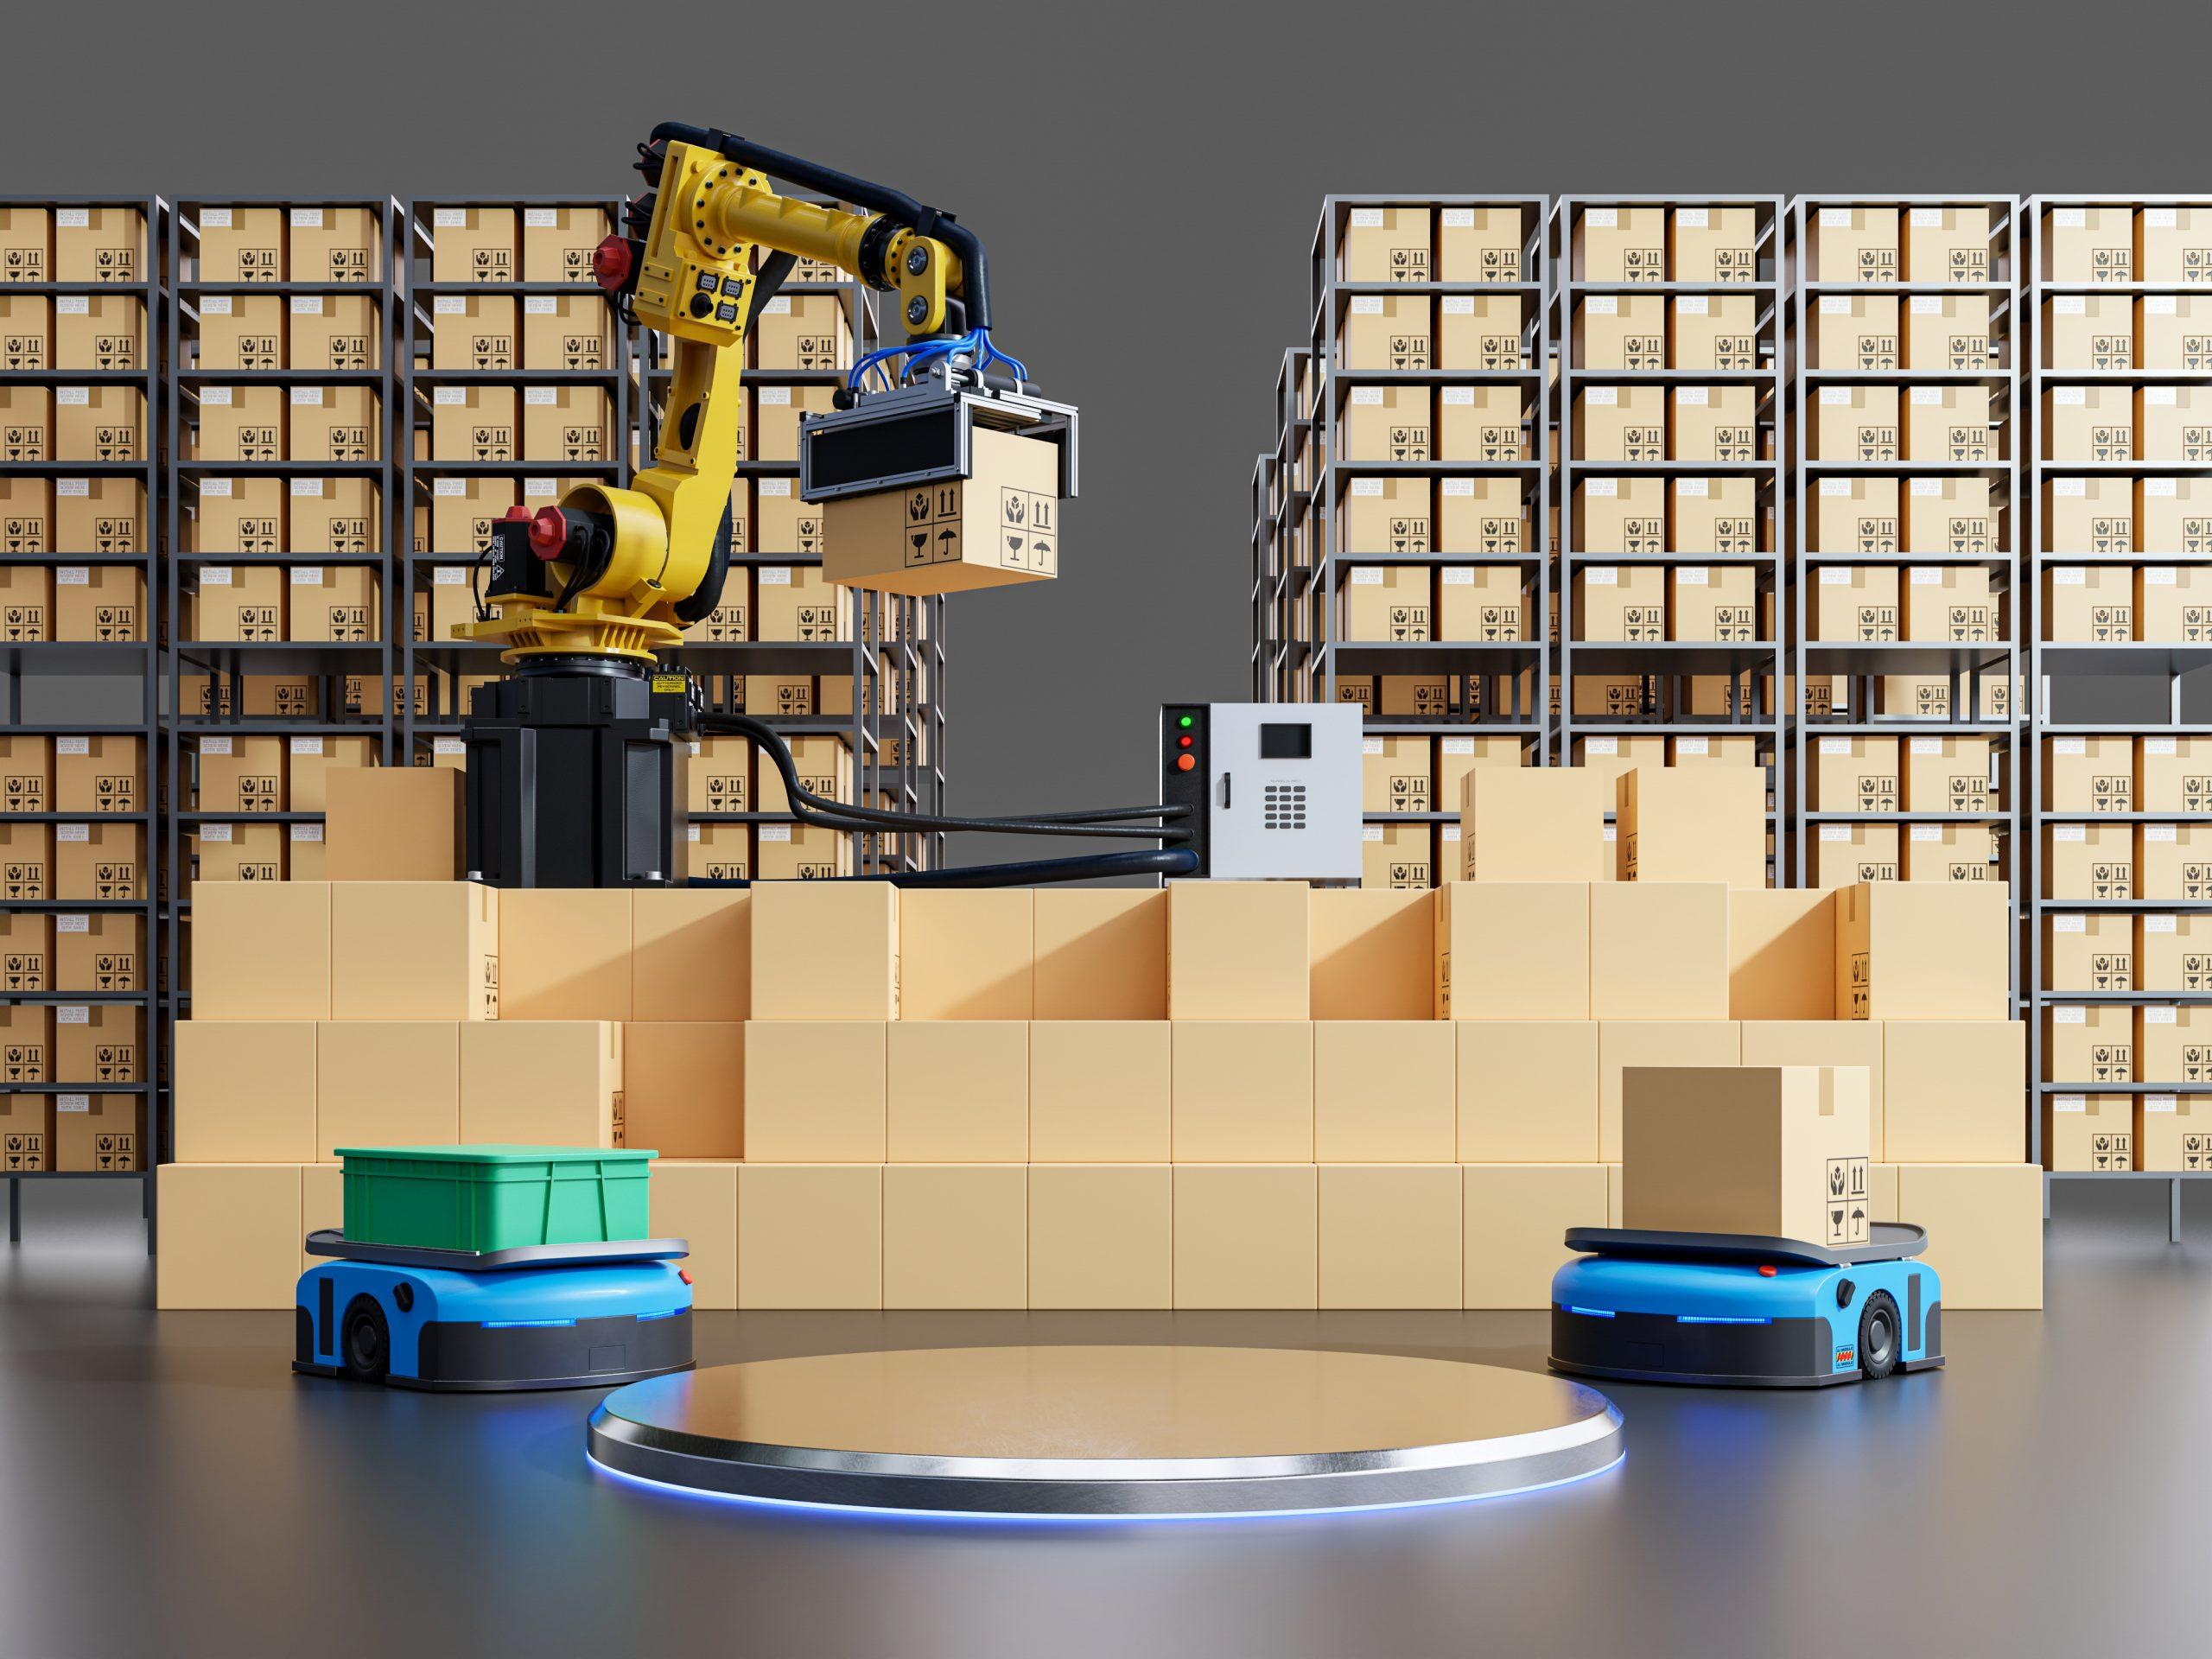 Dynamics 365 Warehouse Management System